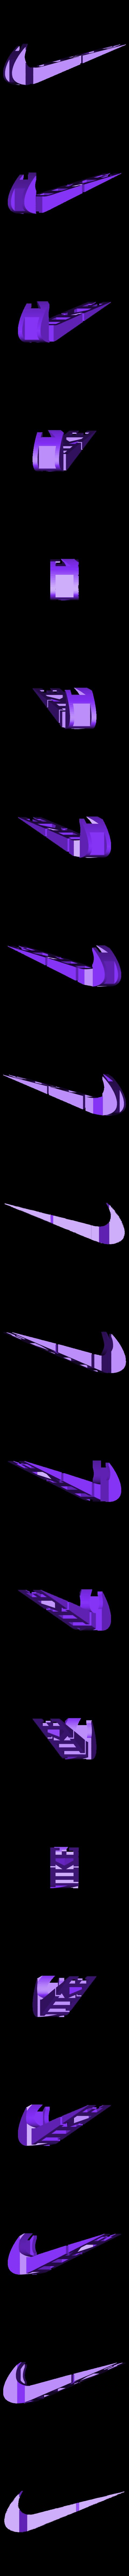 NIKE.stl Download STL file Text Flip, Nike • 3D print object, MrP023